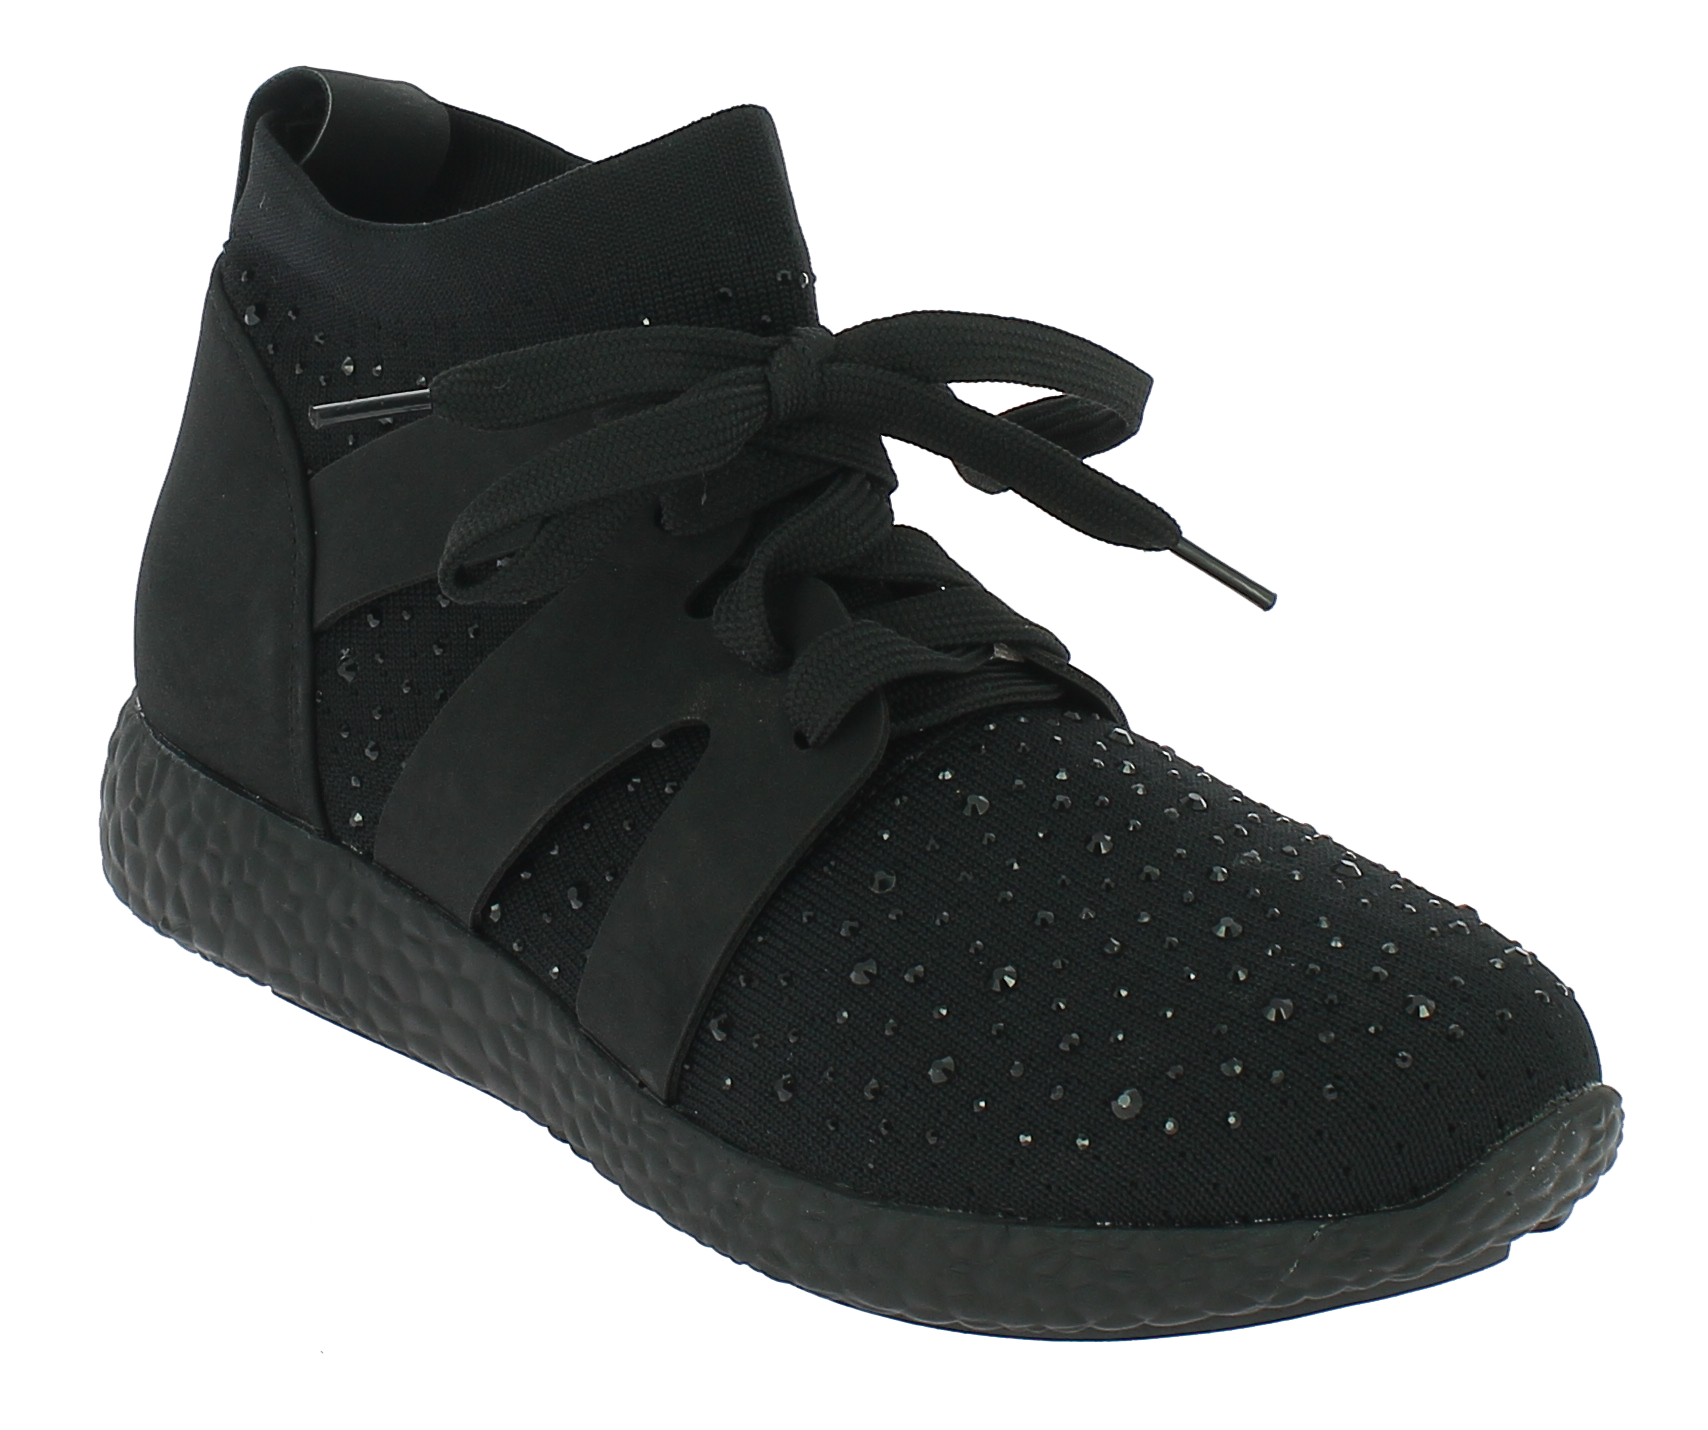 IQSHOES Γυναικείο Casual 7A748 Μαύρο - IqShoes - 7A748 BLACK-black-38/1/15/11 παπούτσια  new in